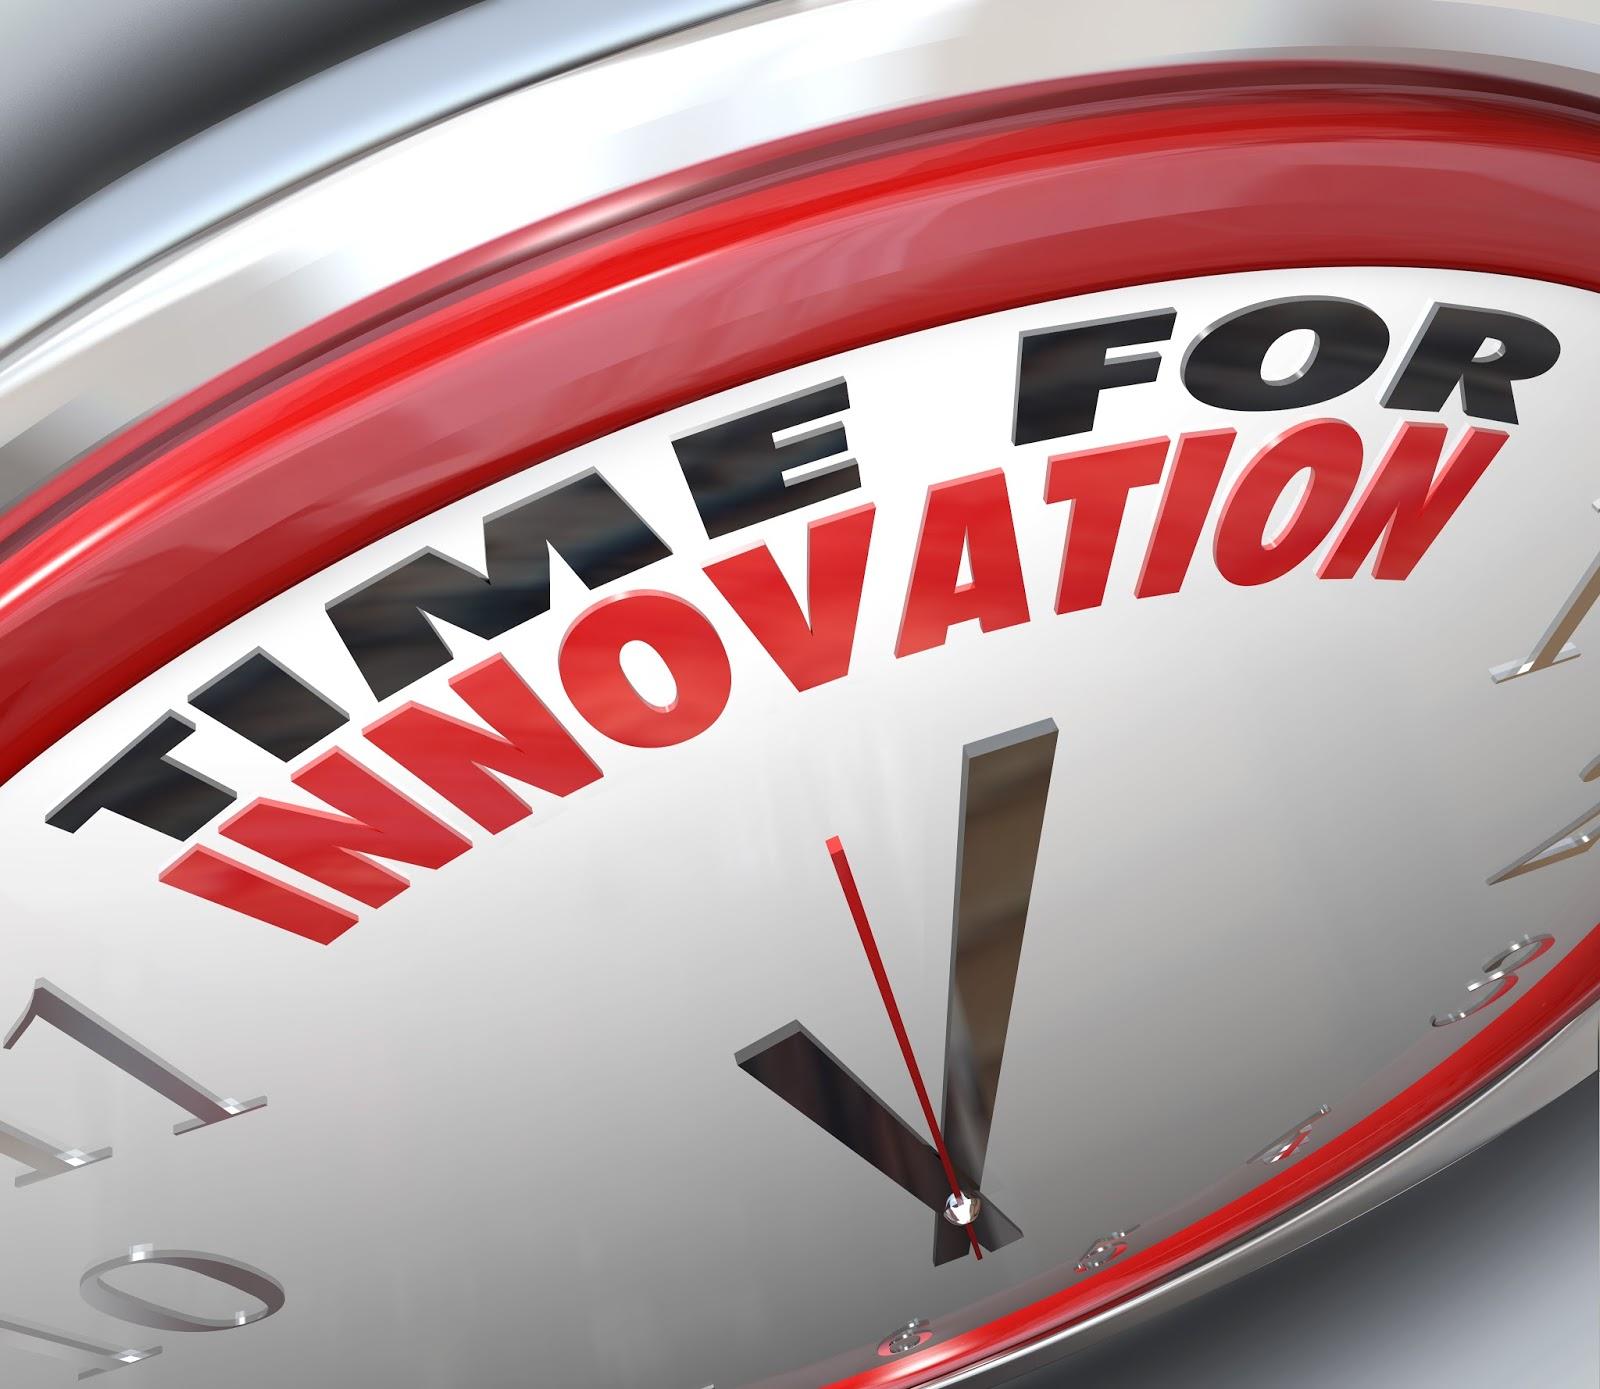 Innovar o Inventar